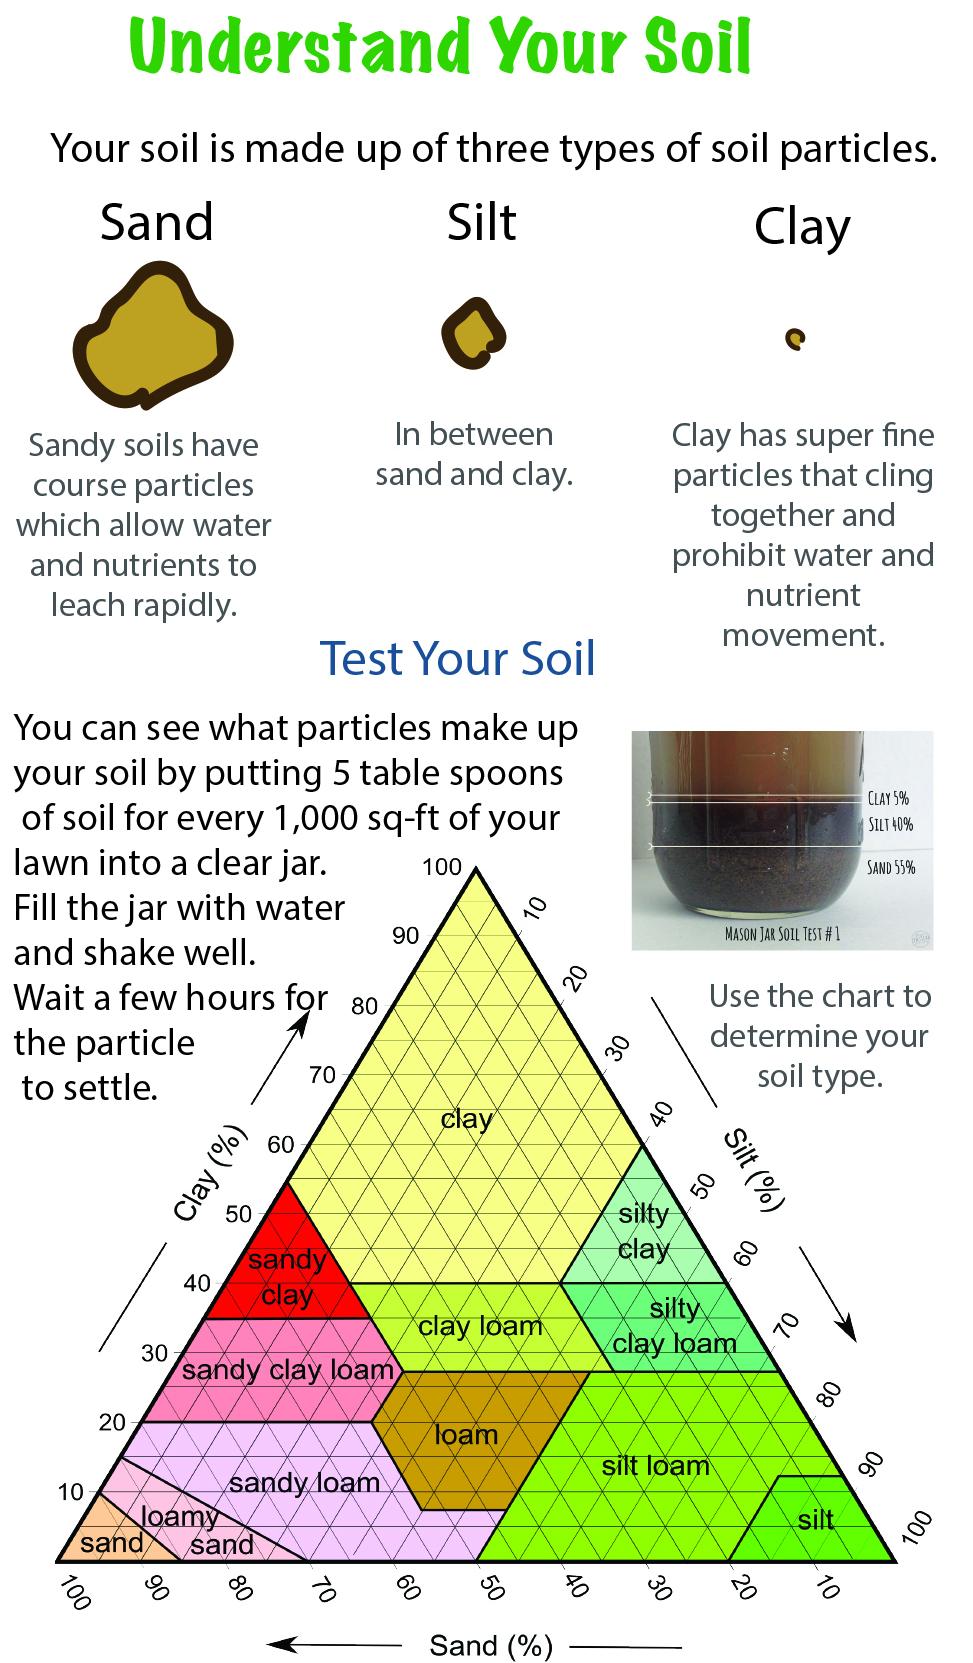 Salt Lake City Soil Structure How to test clay soil, sandy soil, loam.jpg